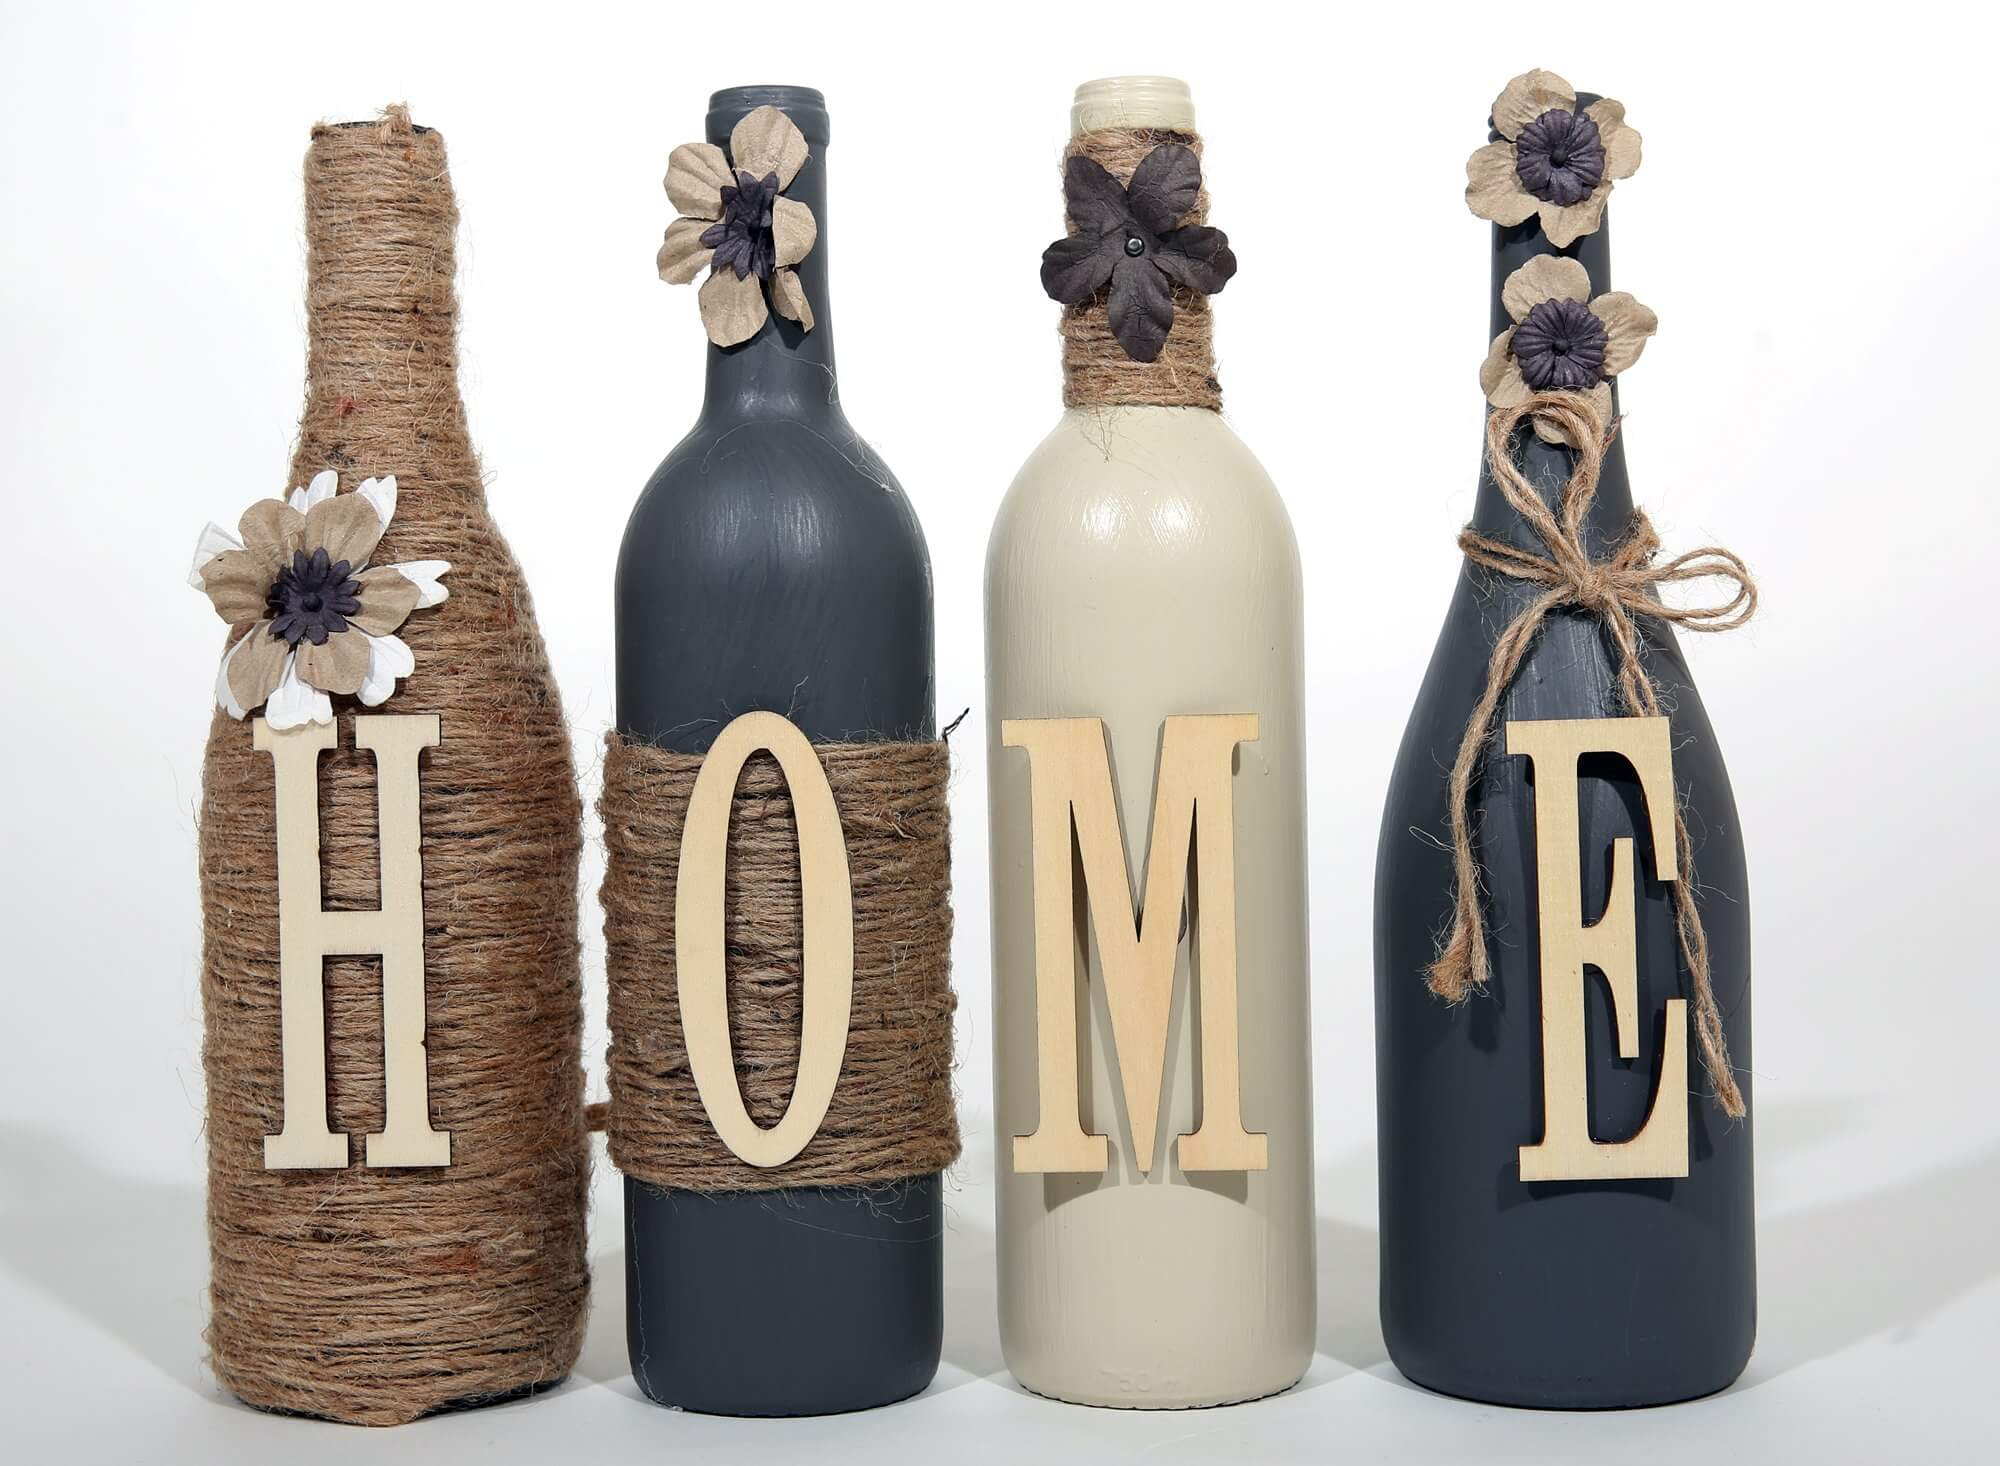 Image of H-O-M-E bottles